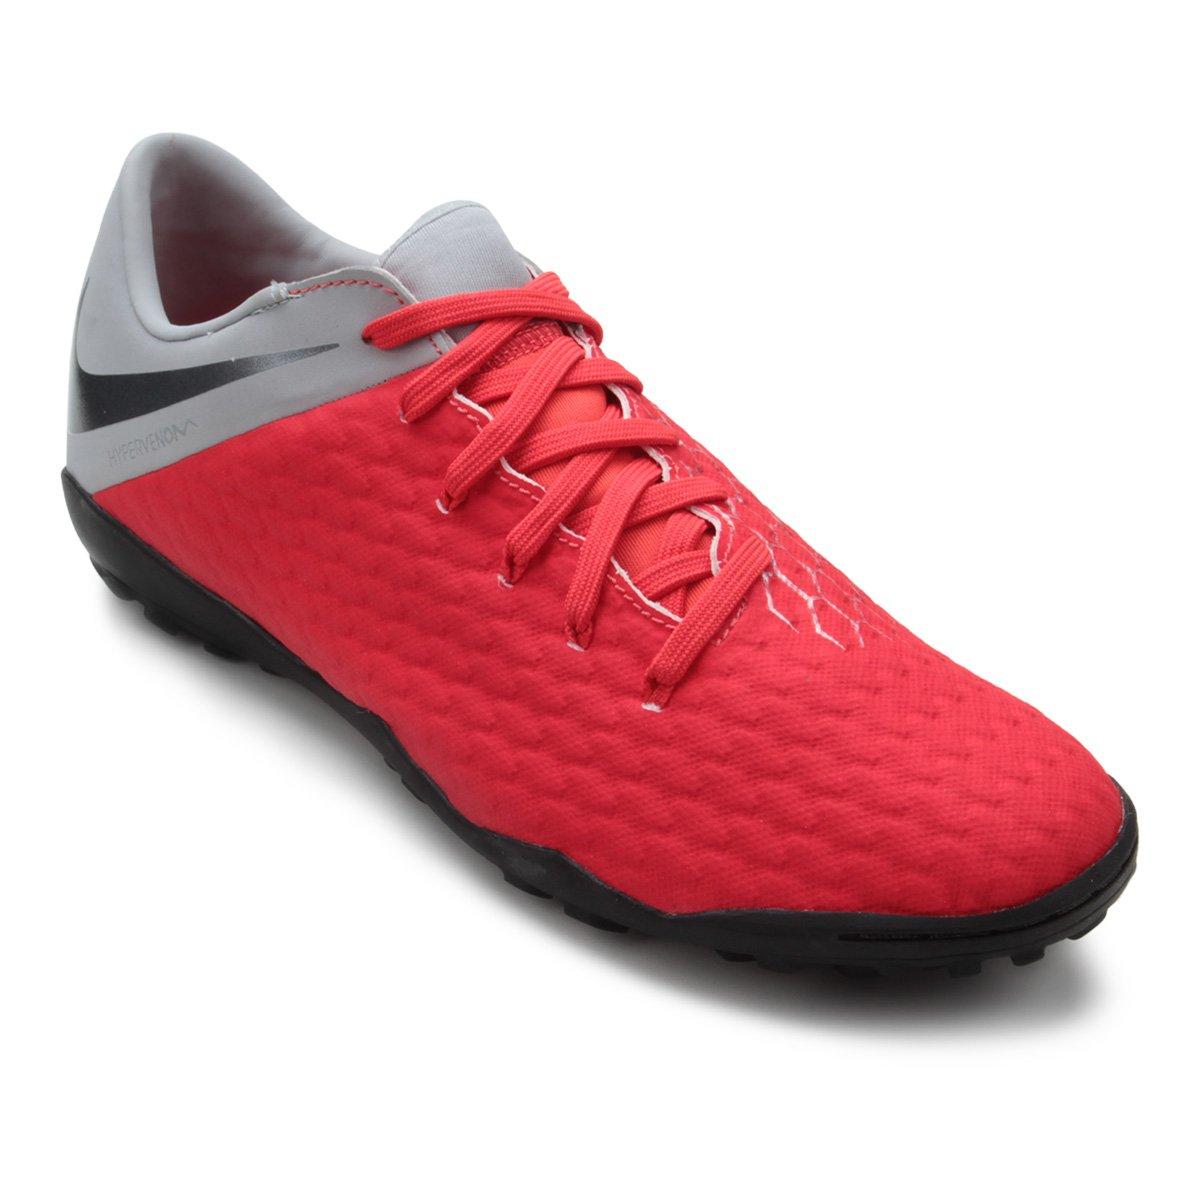 78da672126 Vermelho TF Society Nike Academy 3 Masculina Nike Chuteira Chuteira Society  Hypervenom vwwPA4q ...